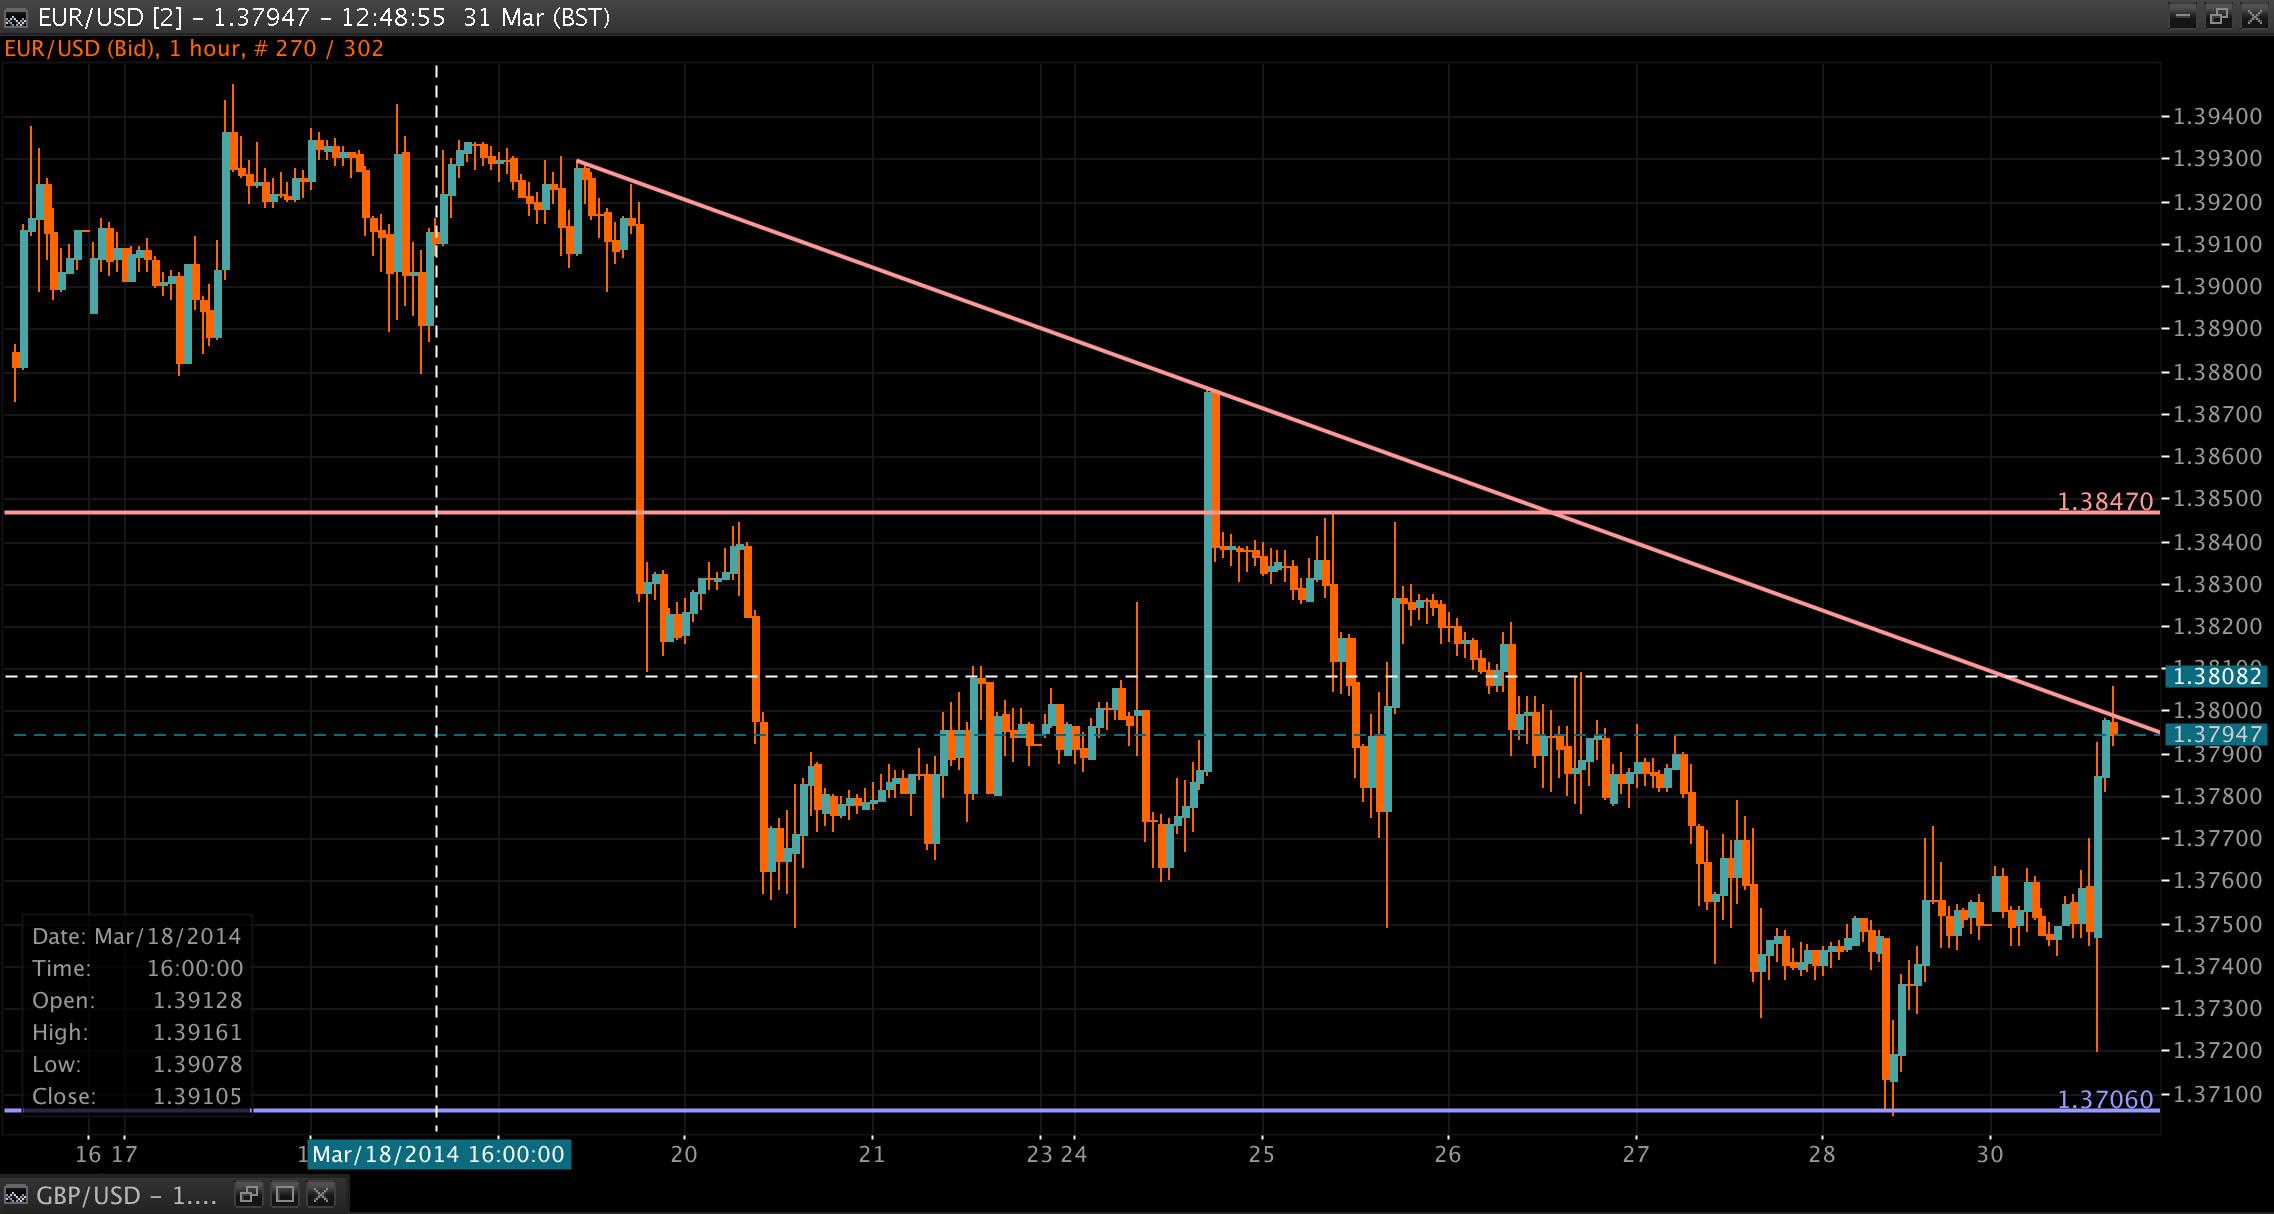 EUR/USD Chart 31 Mar 2014